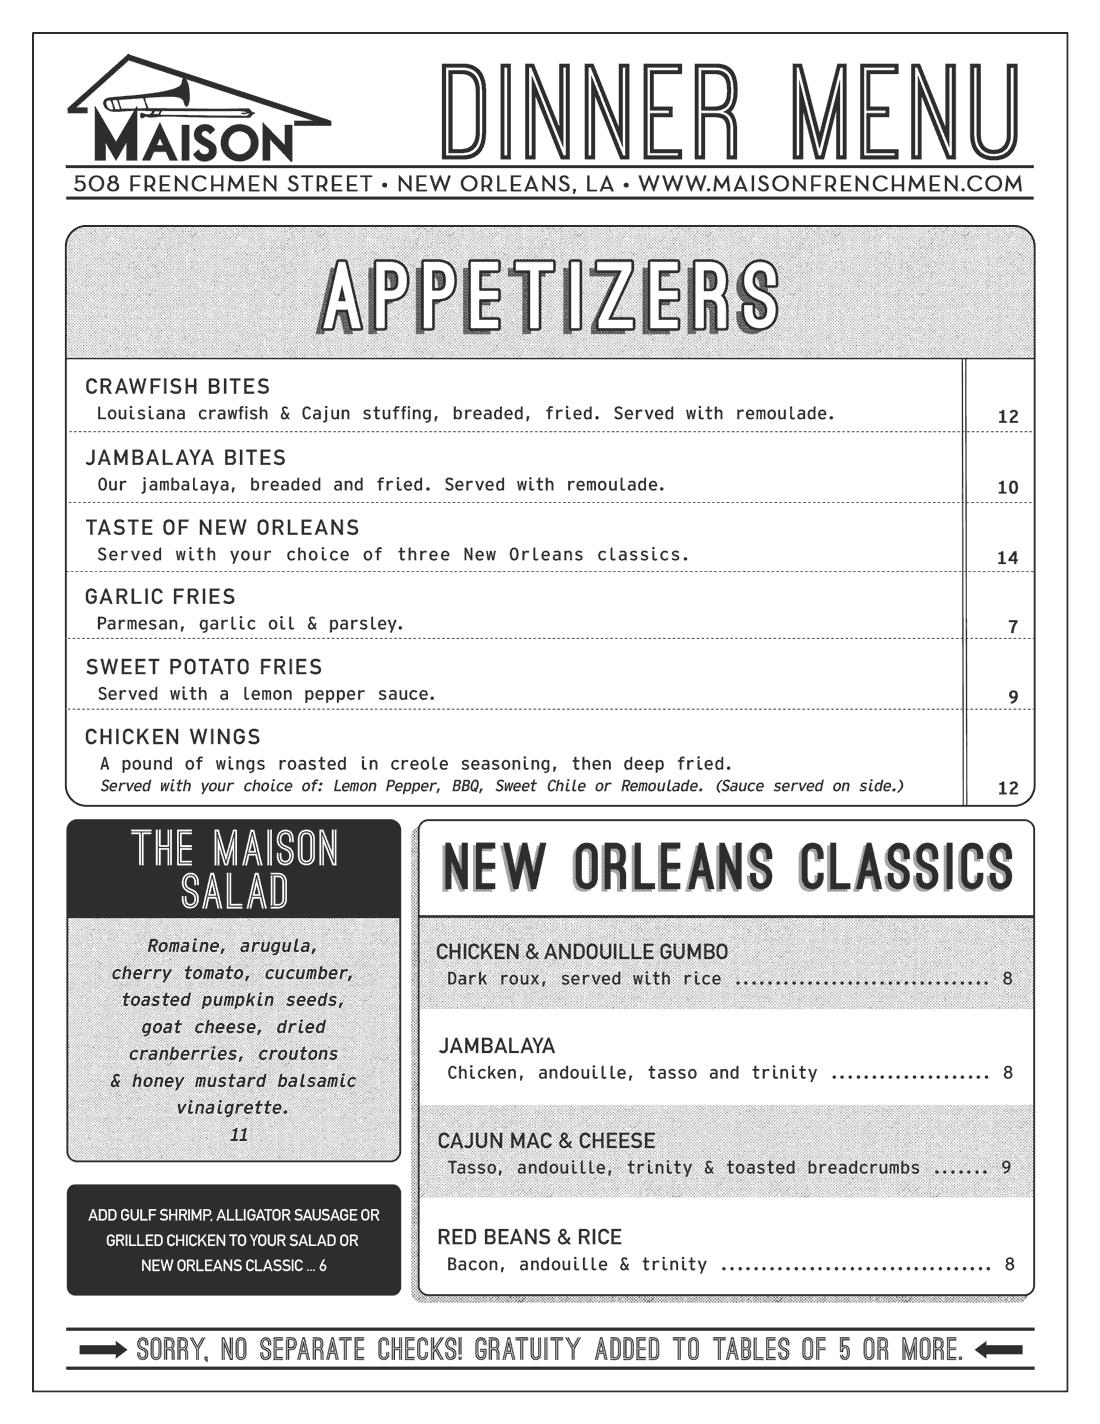 The Maison Dinner Menu 2019 Side 1